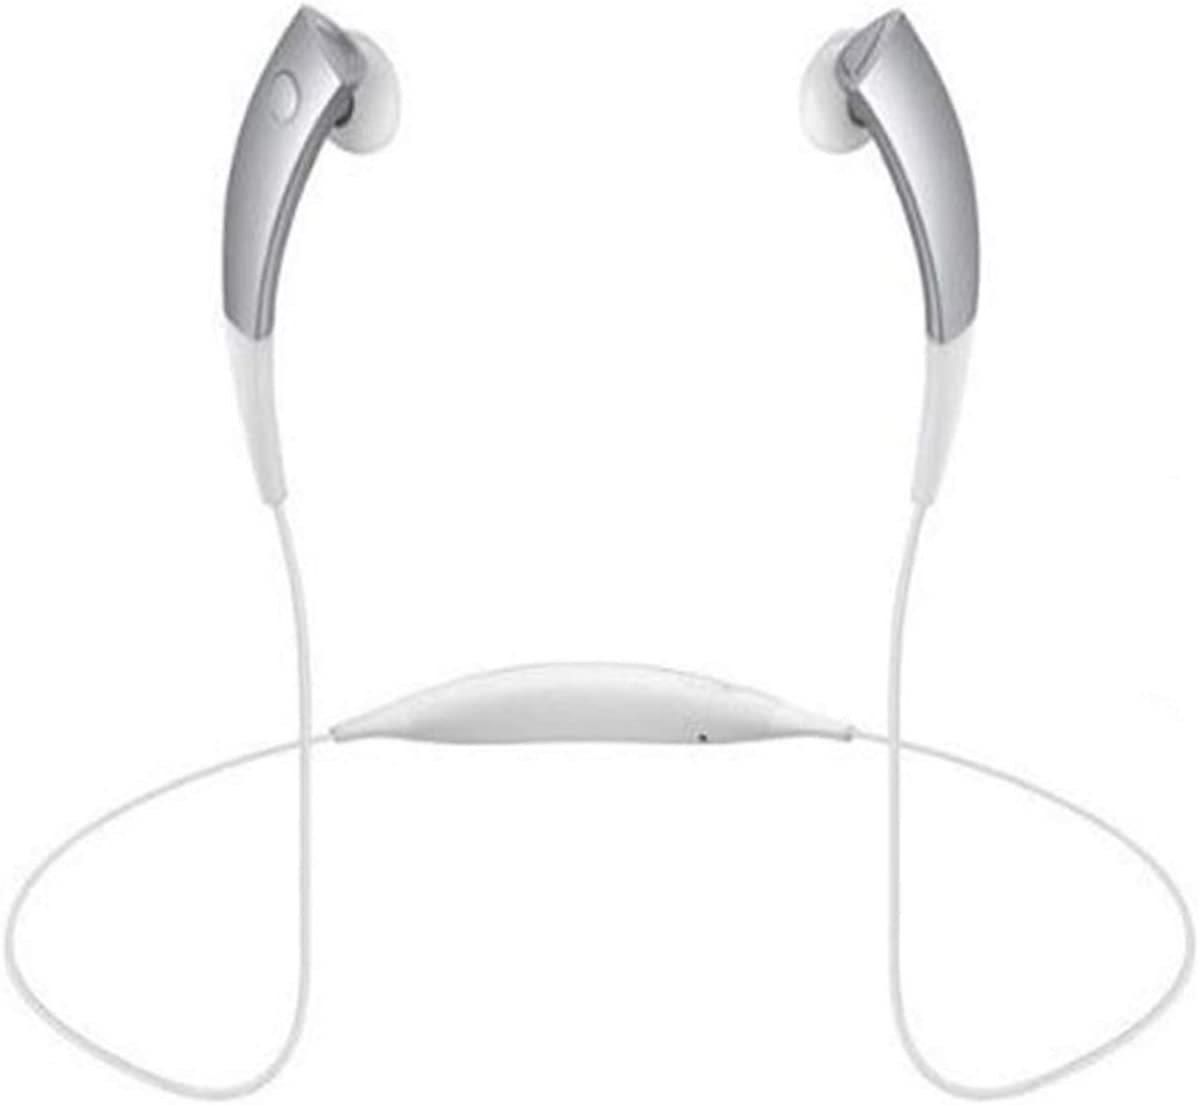 LICHIFIT SM-R130 Gear Circle - Auriculares inalámbricos Deportivos con Bluetooth para Samsung LG